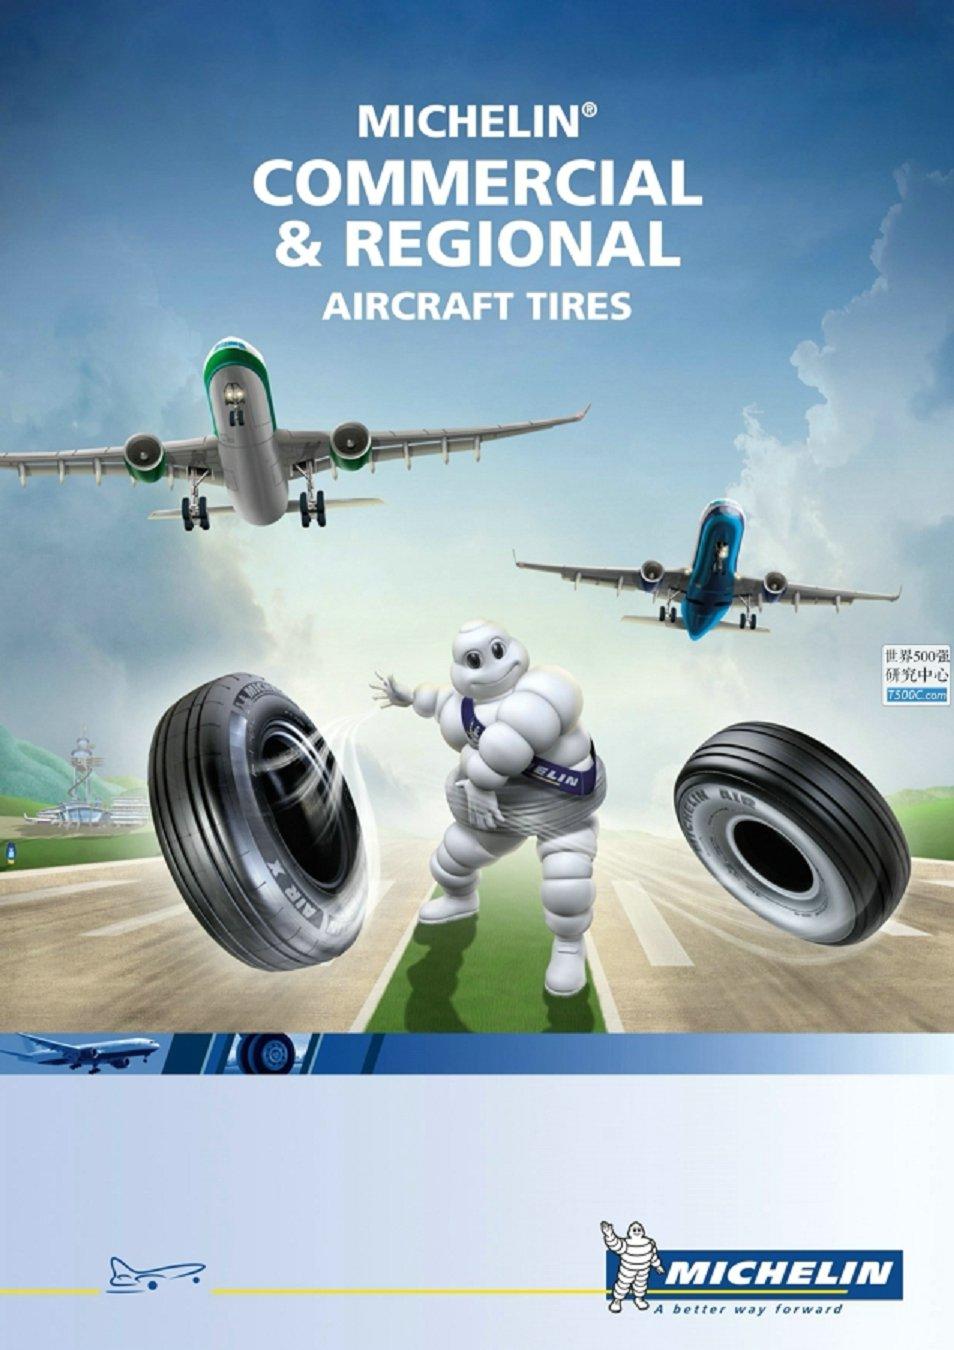 米其林Michelin_产品宣传册Brochure_T500C.com_aircraft tires